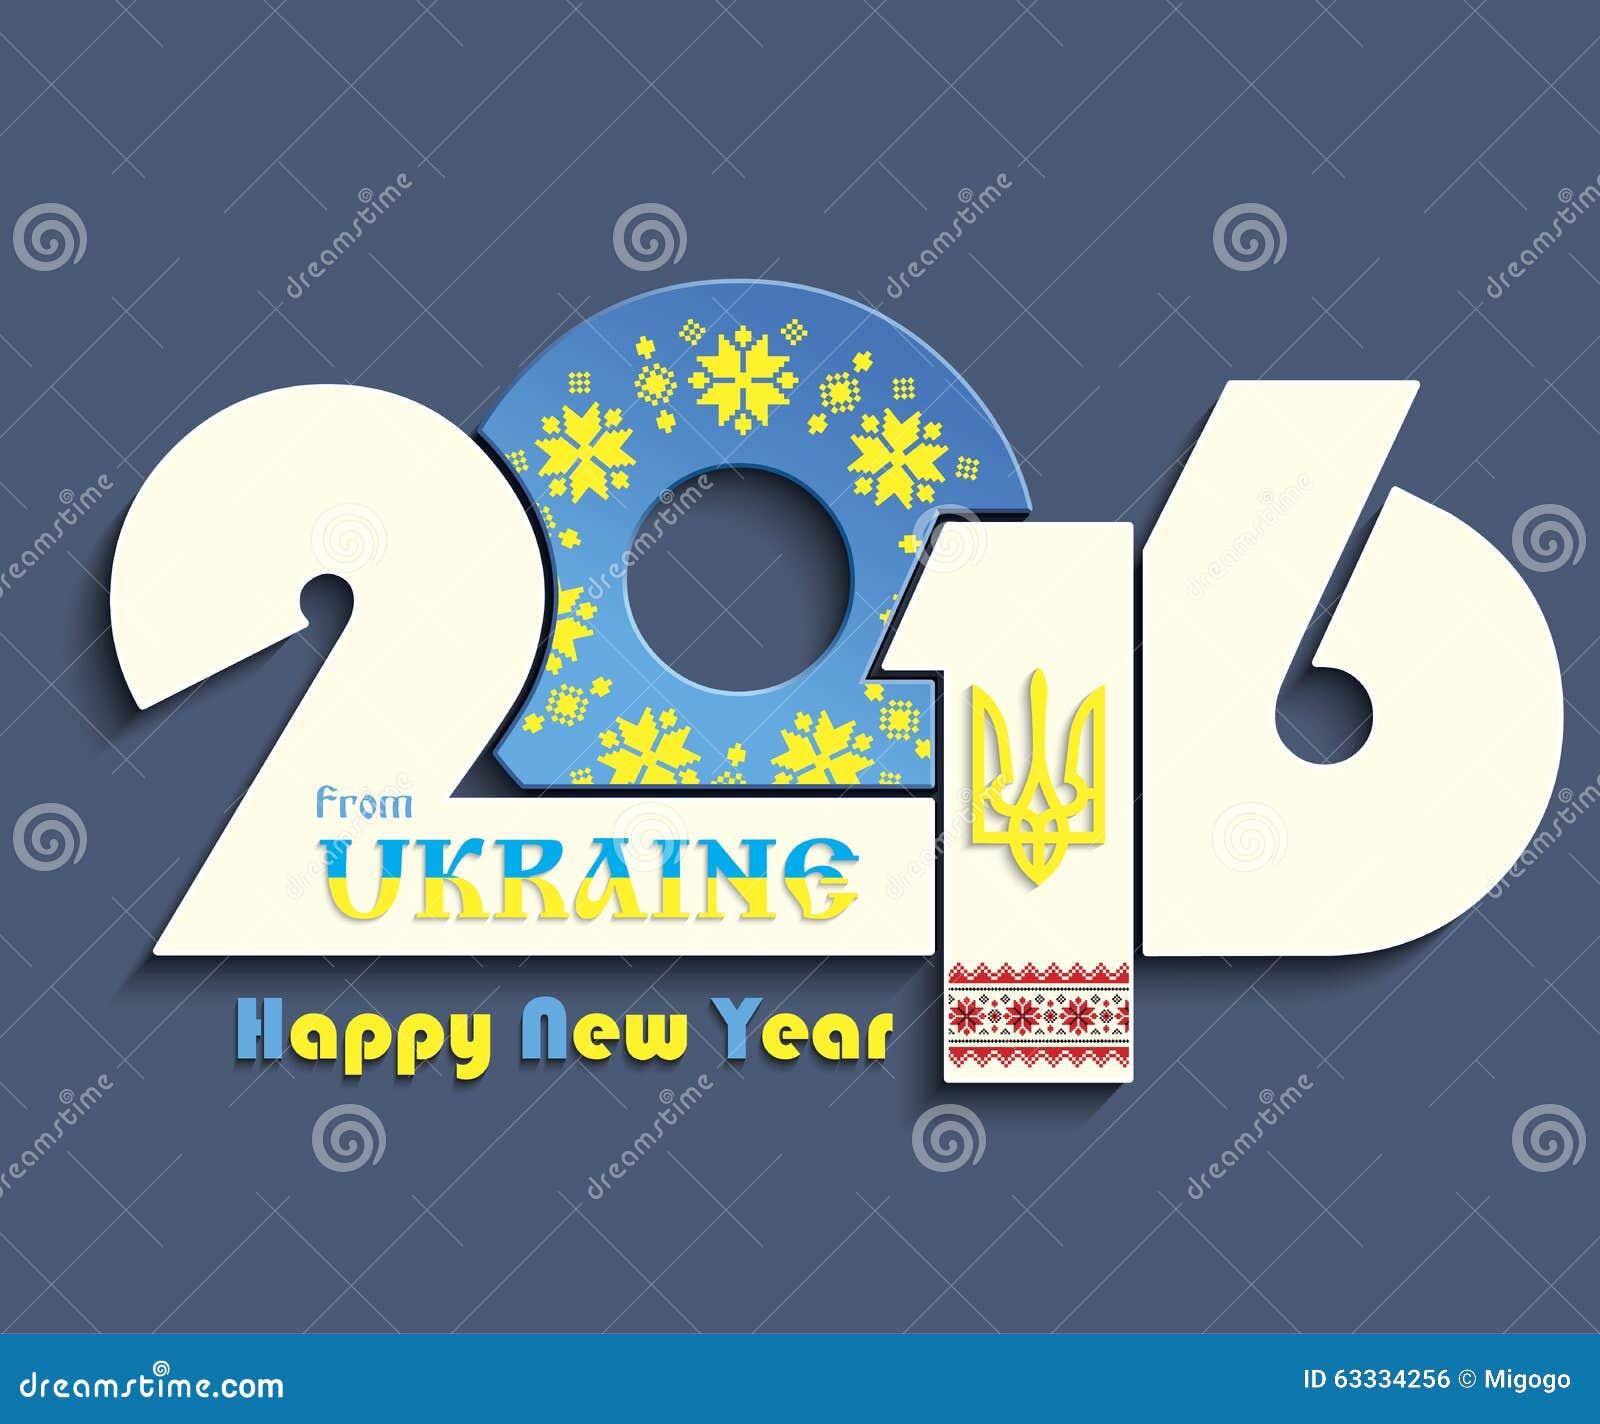 New year 2016 card design with ukrainian motives stock illustration new year 2016 card design with ukrainian motives m4hsunfo